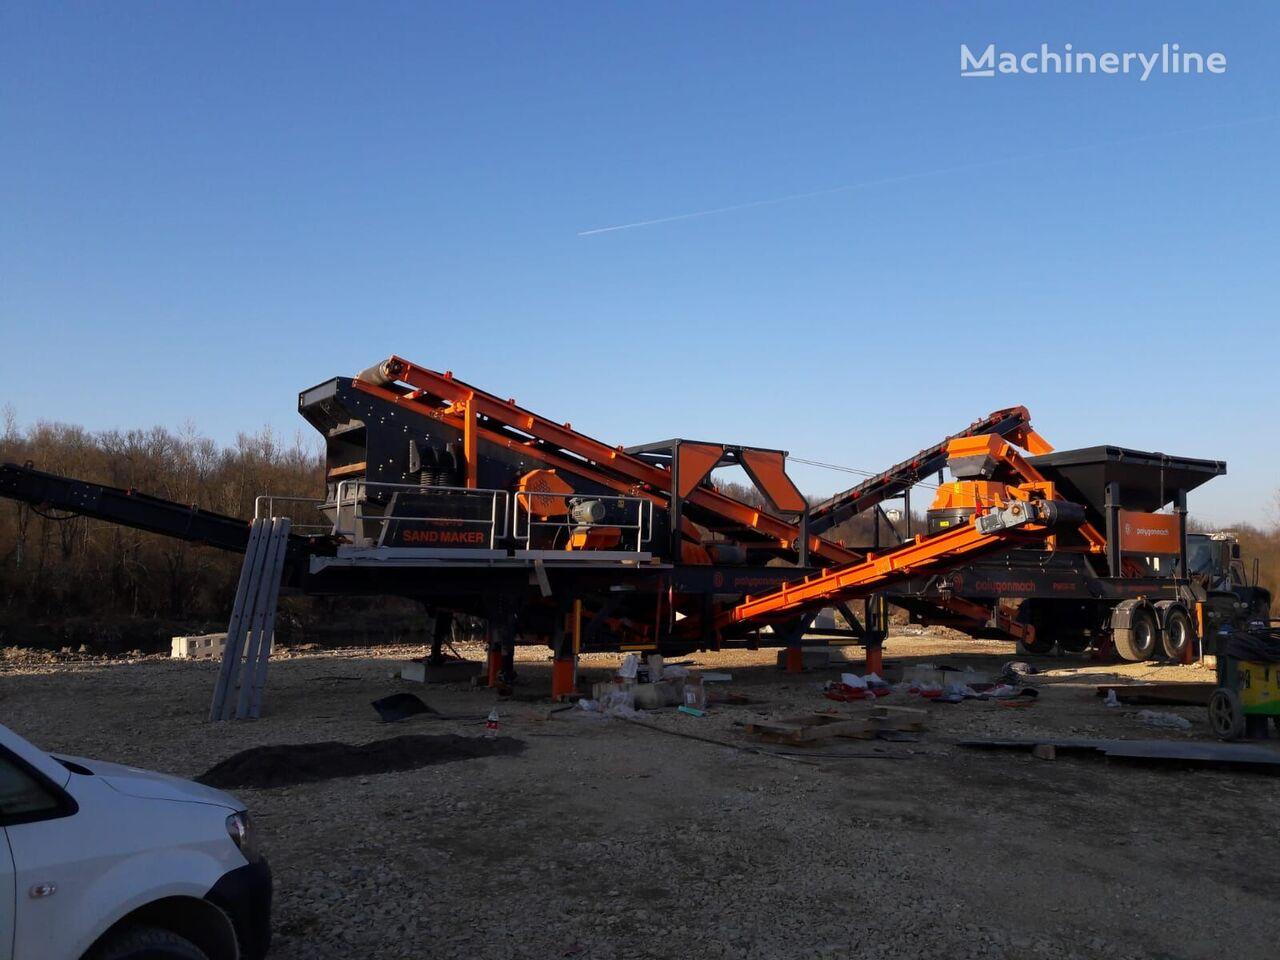 new POLYGONMACH PMVS-70 mobile crushing plant